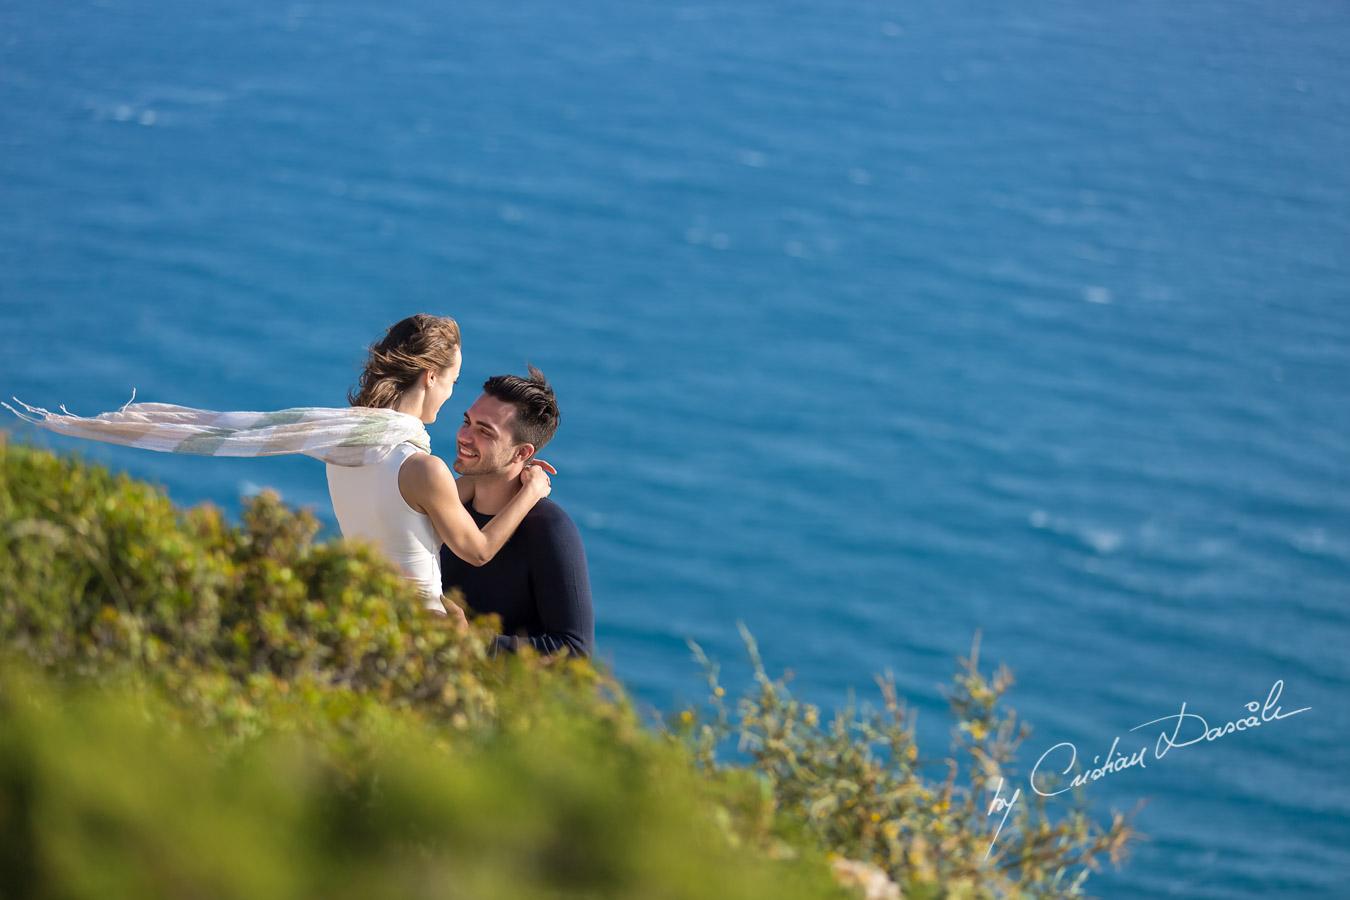 Love at first sight - Karen & Martins at Kurion Cyprus - 09